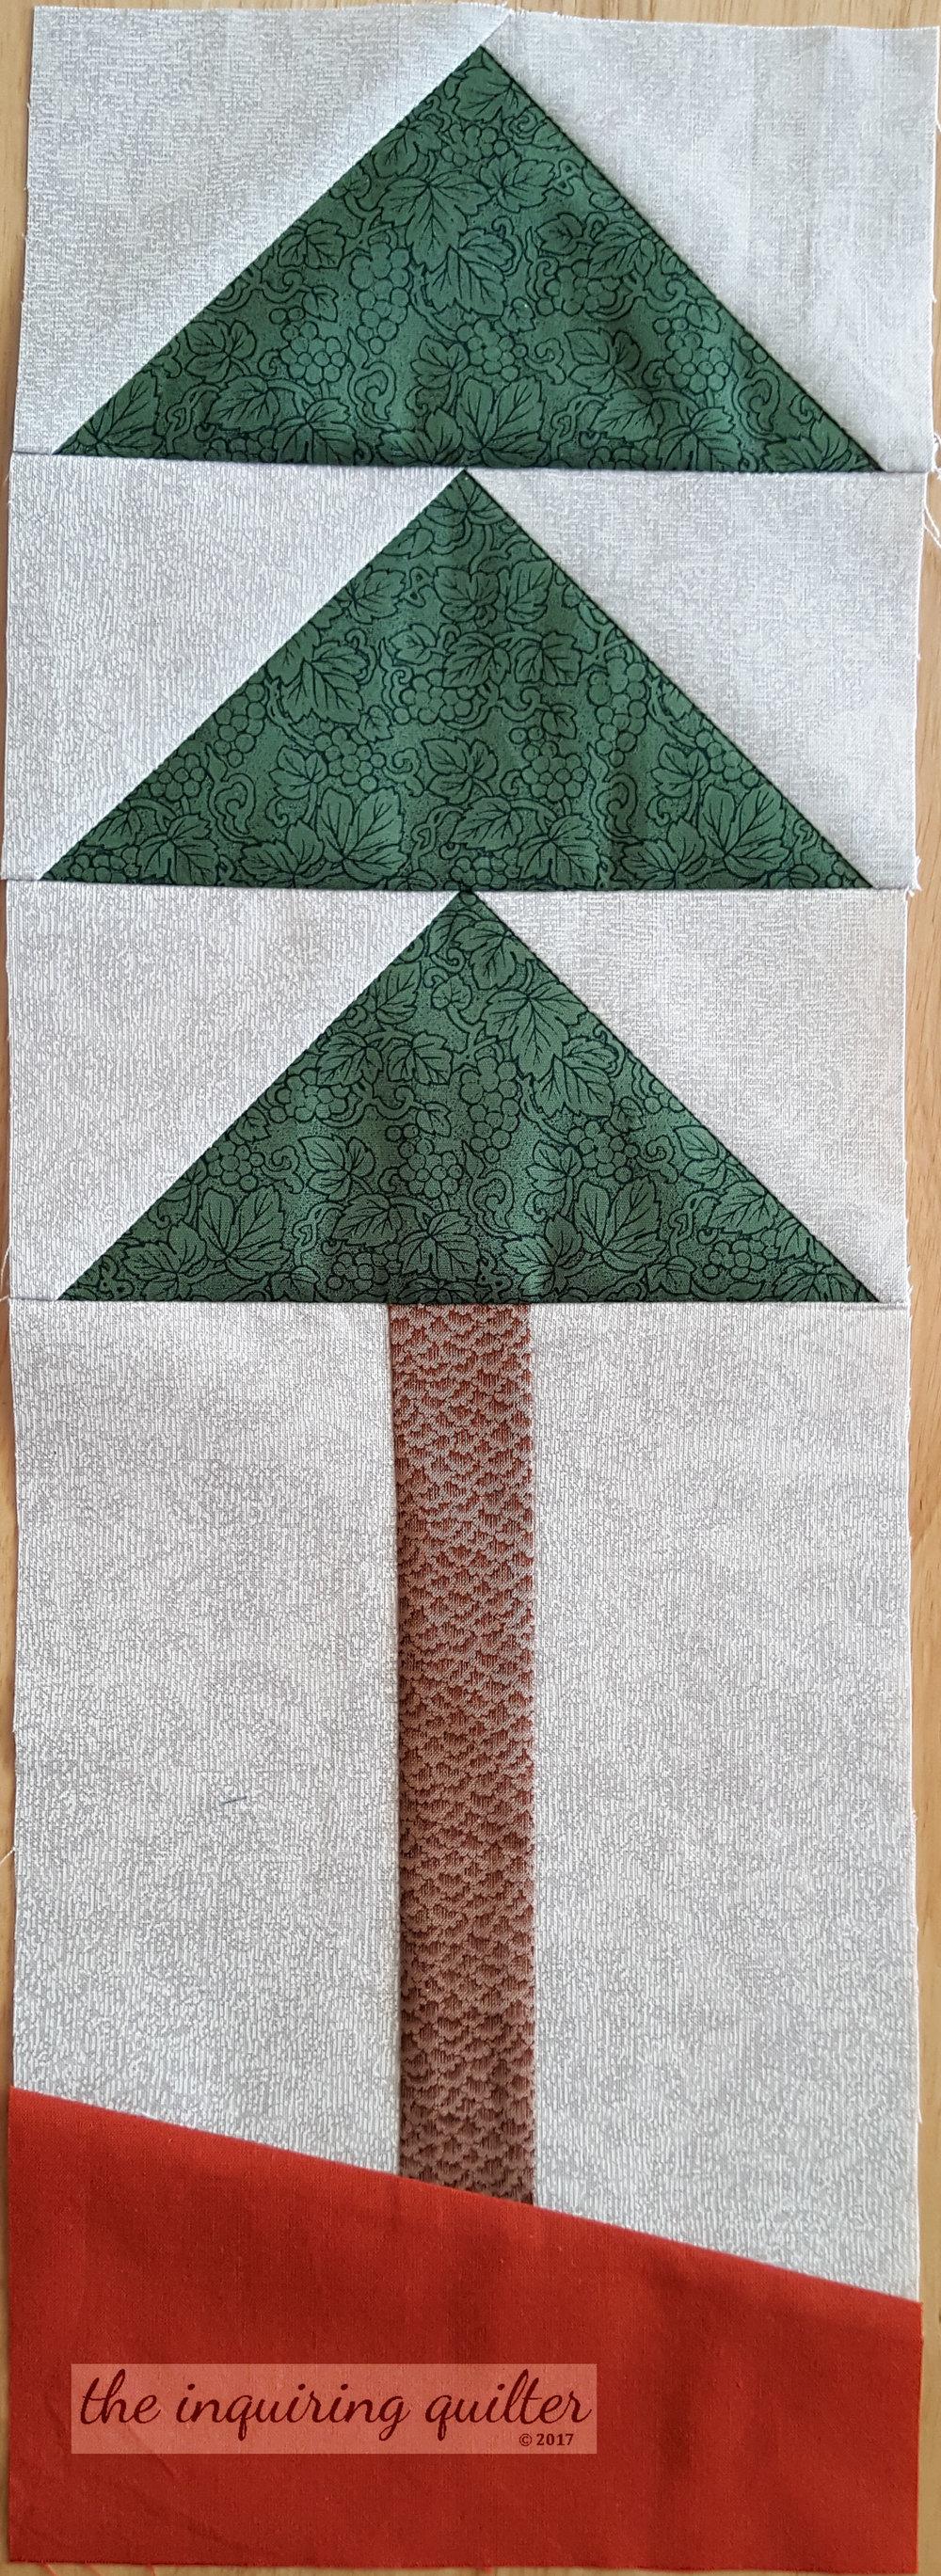 Planted Pines 1.jpg